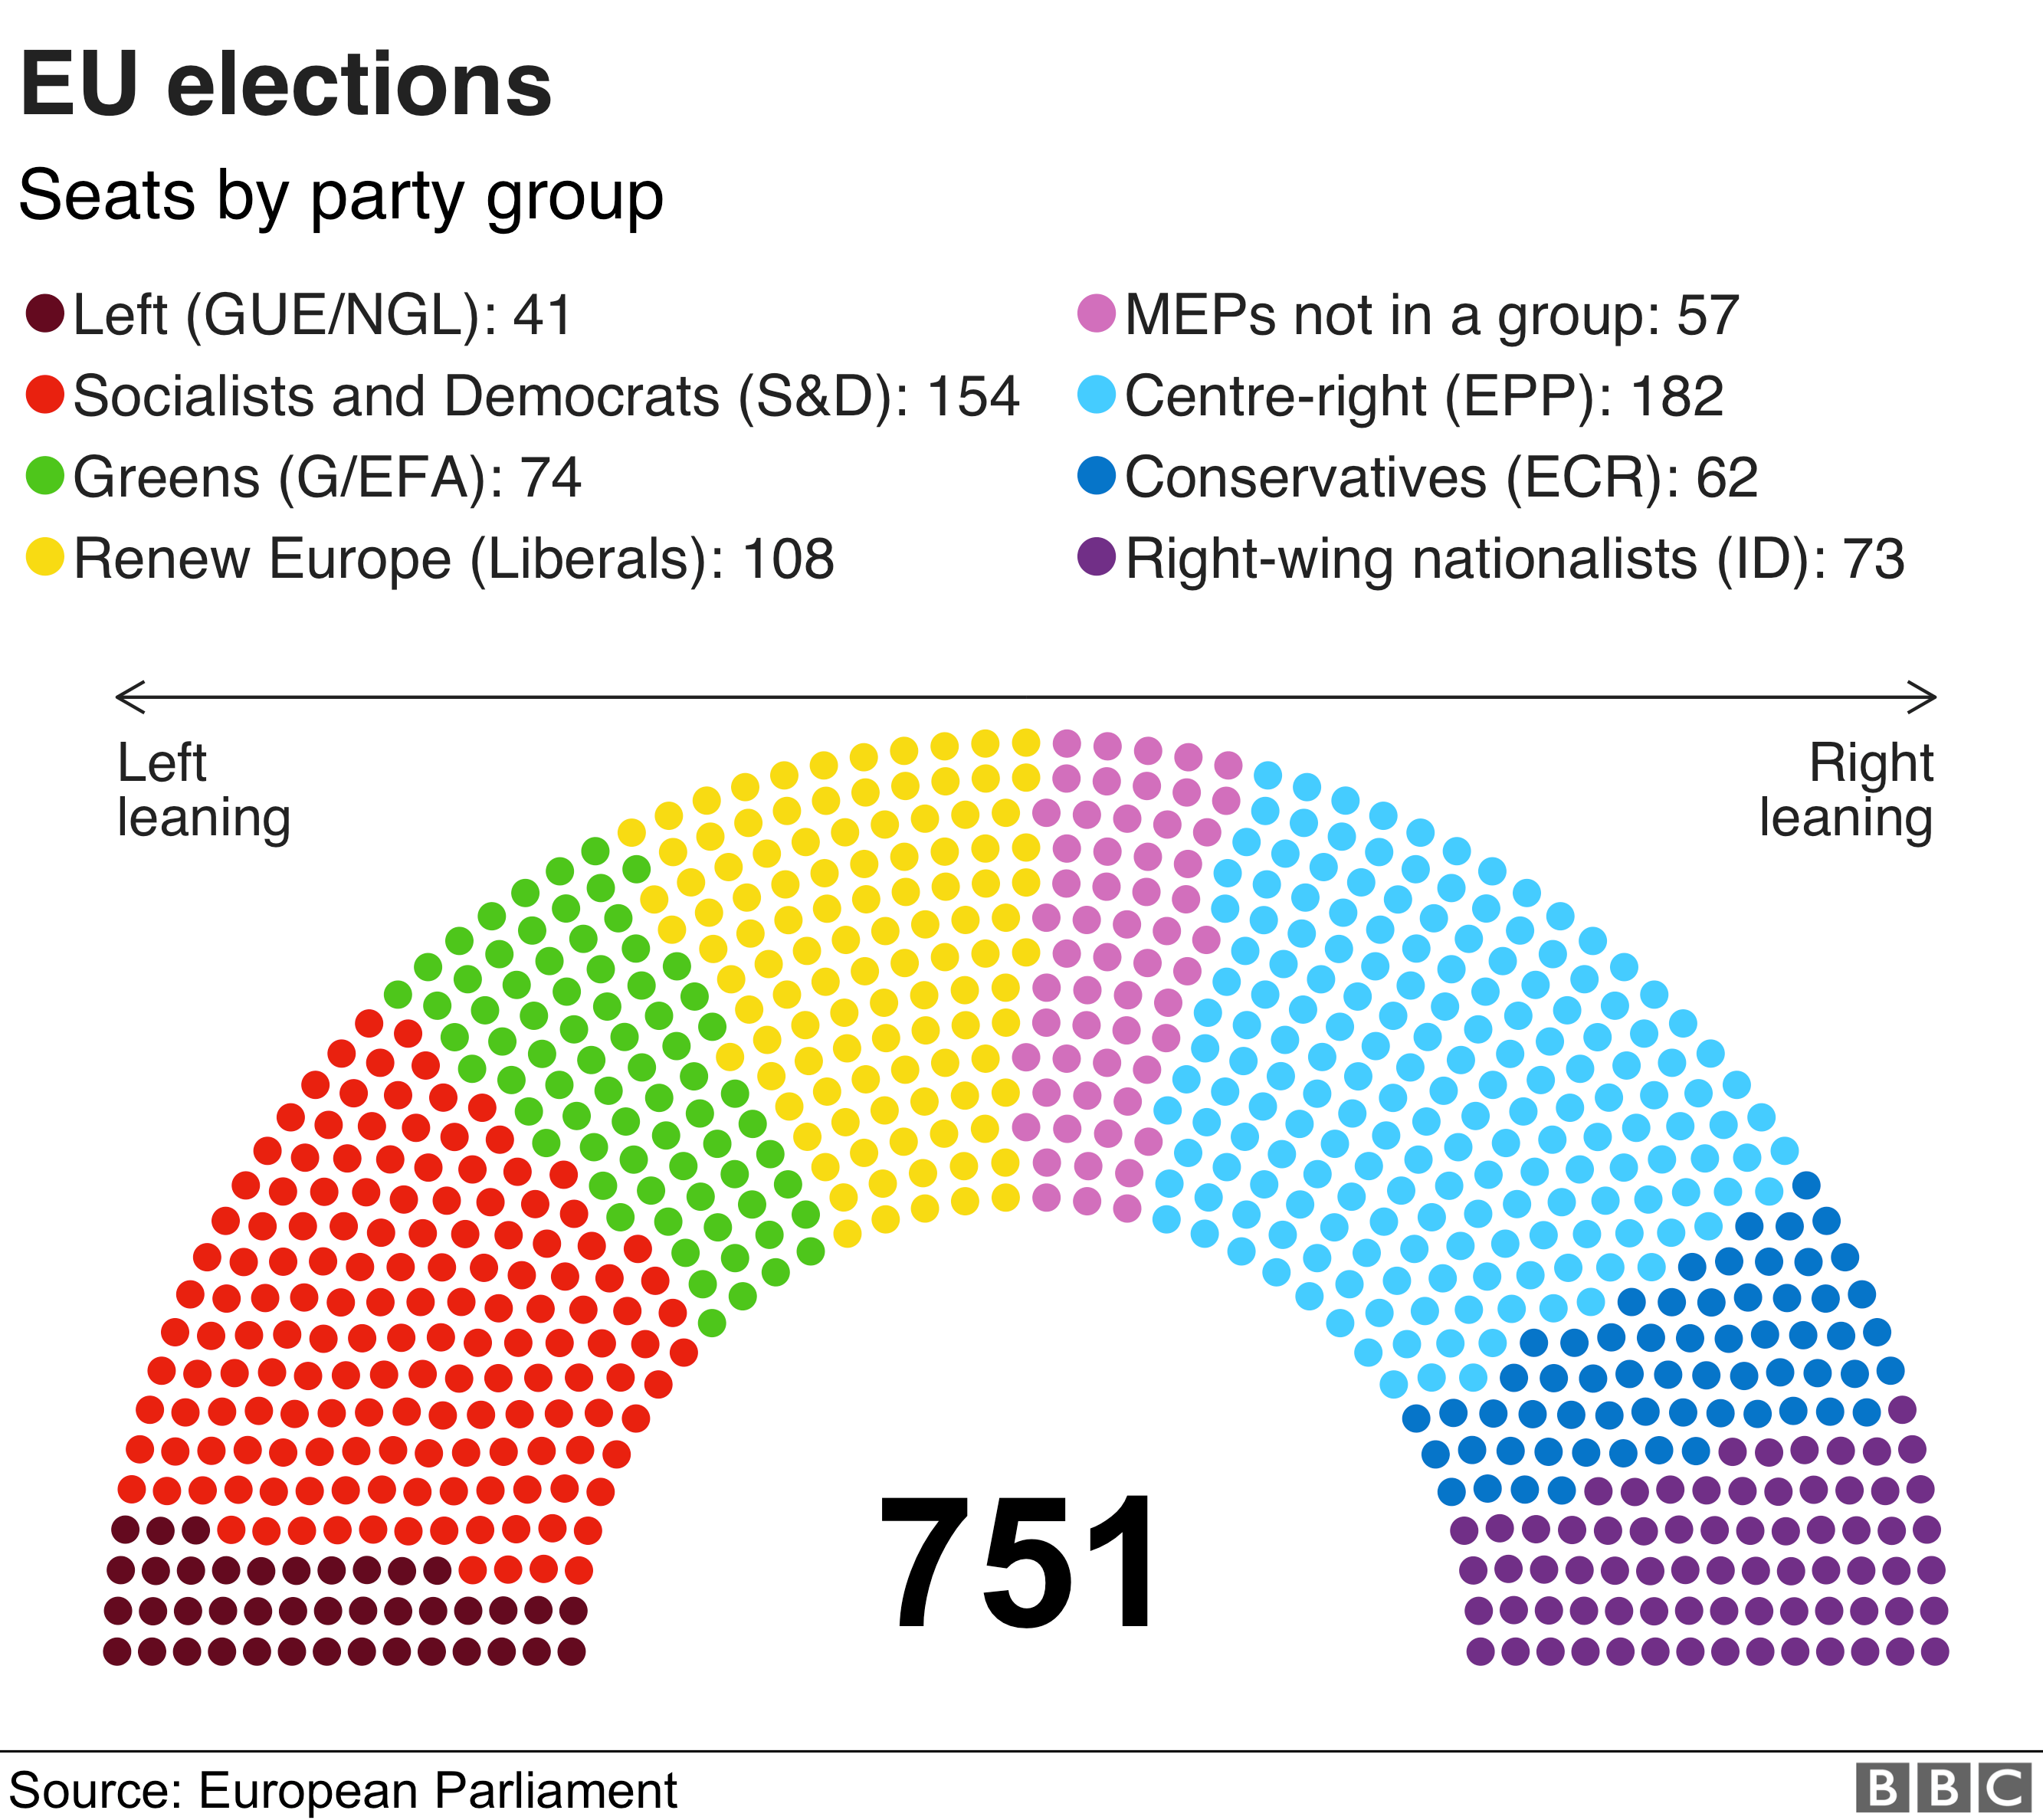 Graph showing composition of European Parliament